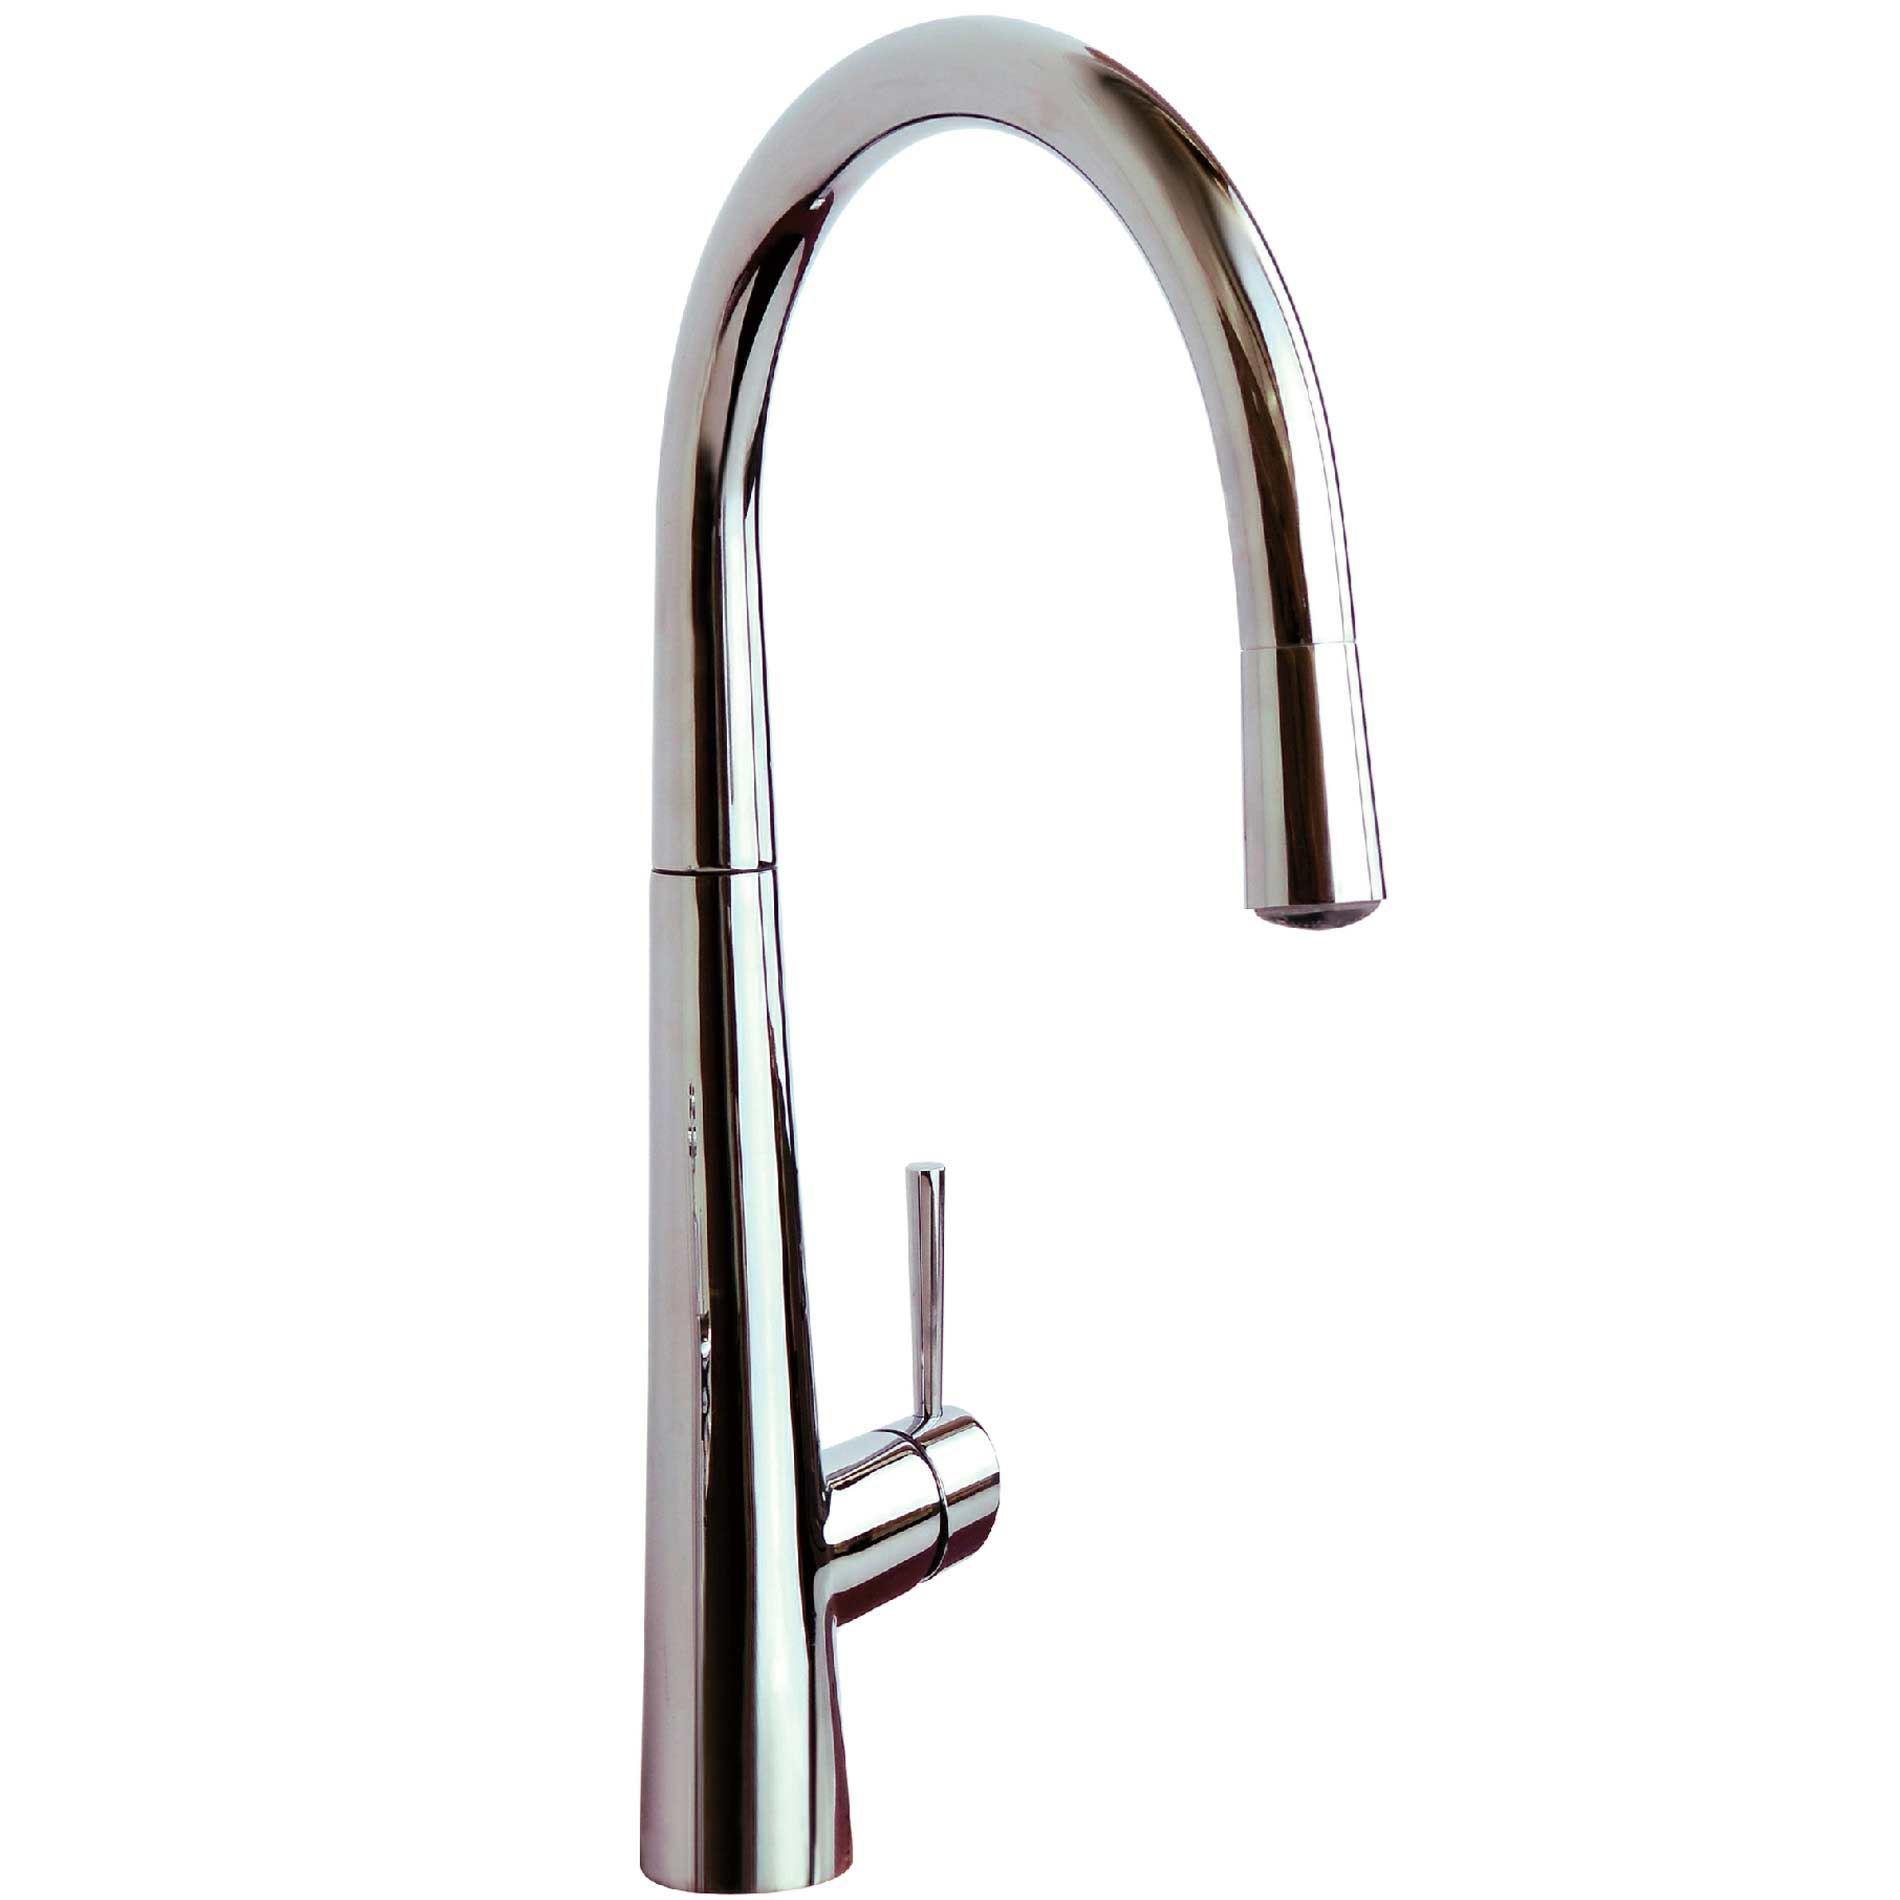 Reginox Virage Led Chrome Pull Out Tap Kitchen Sinks Amp Taps